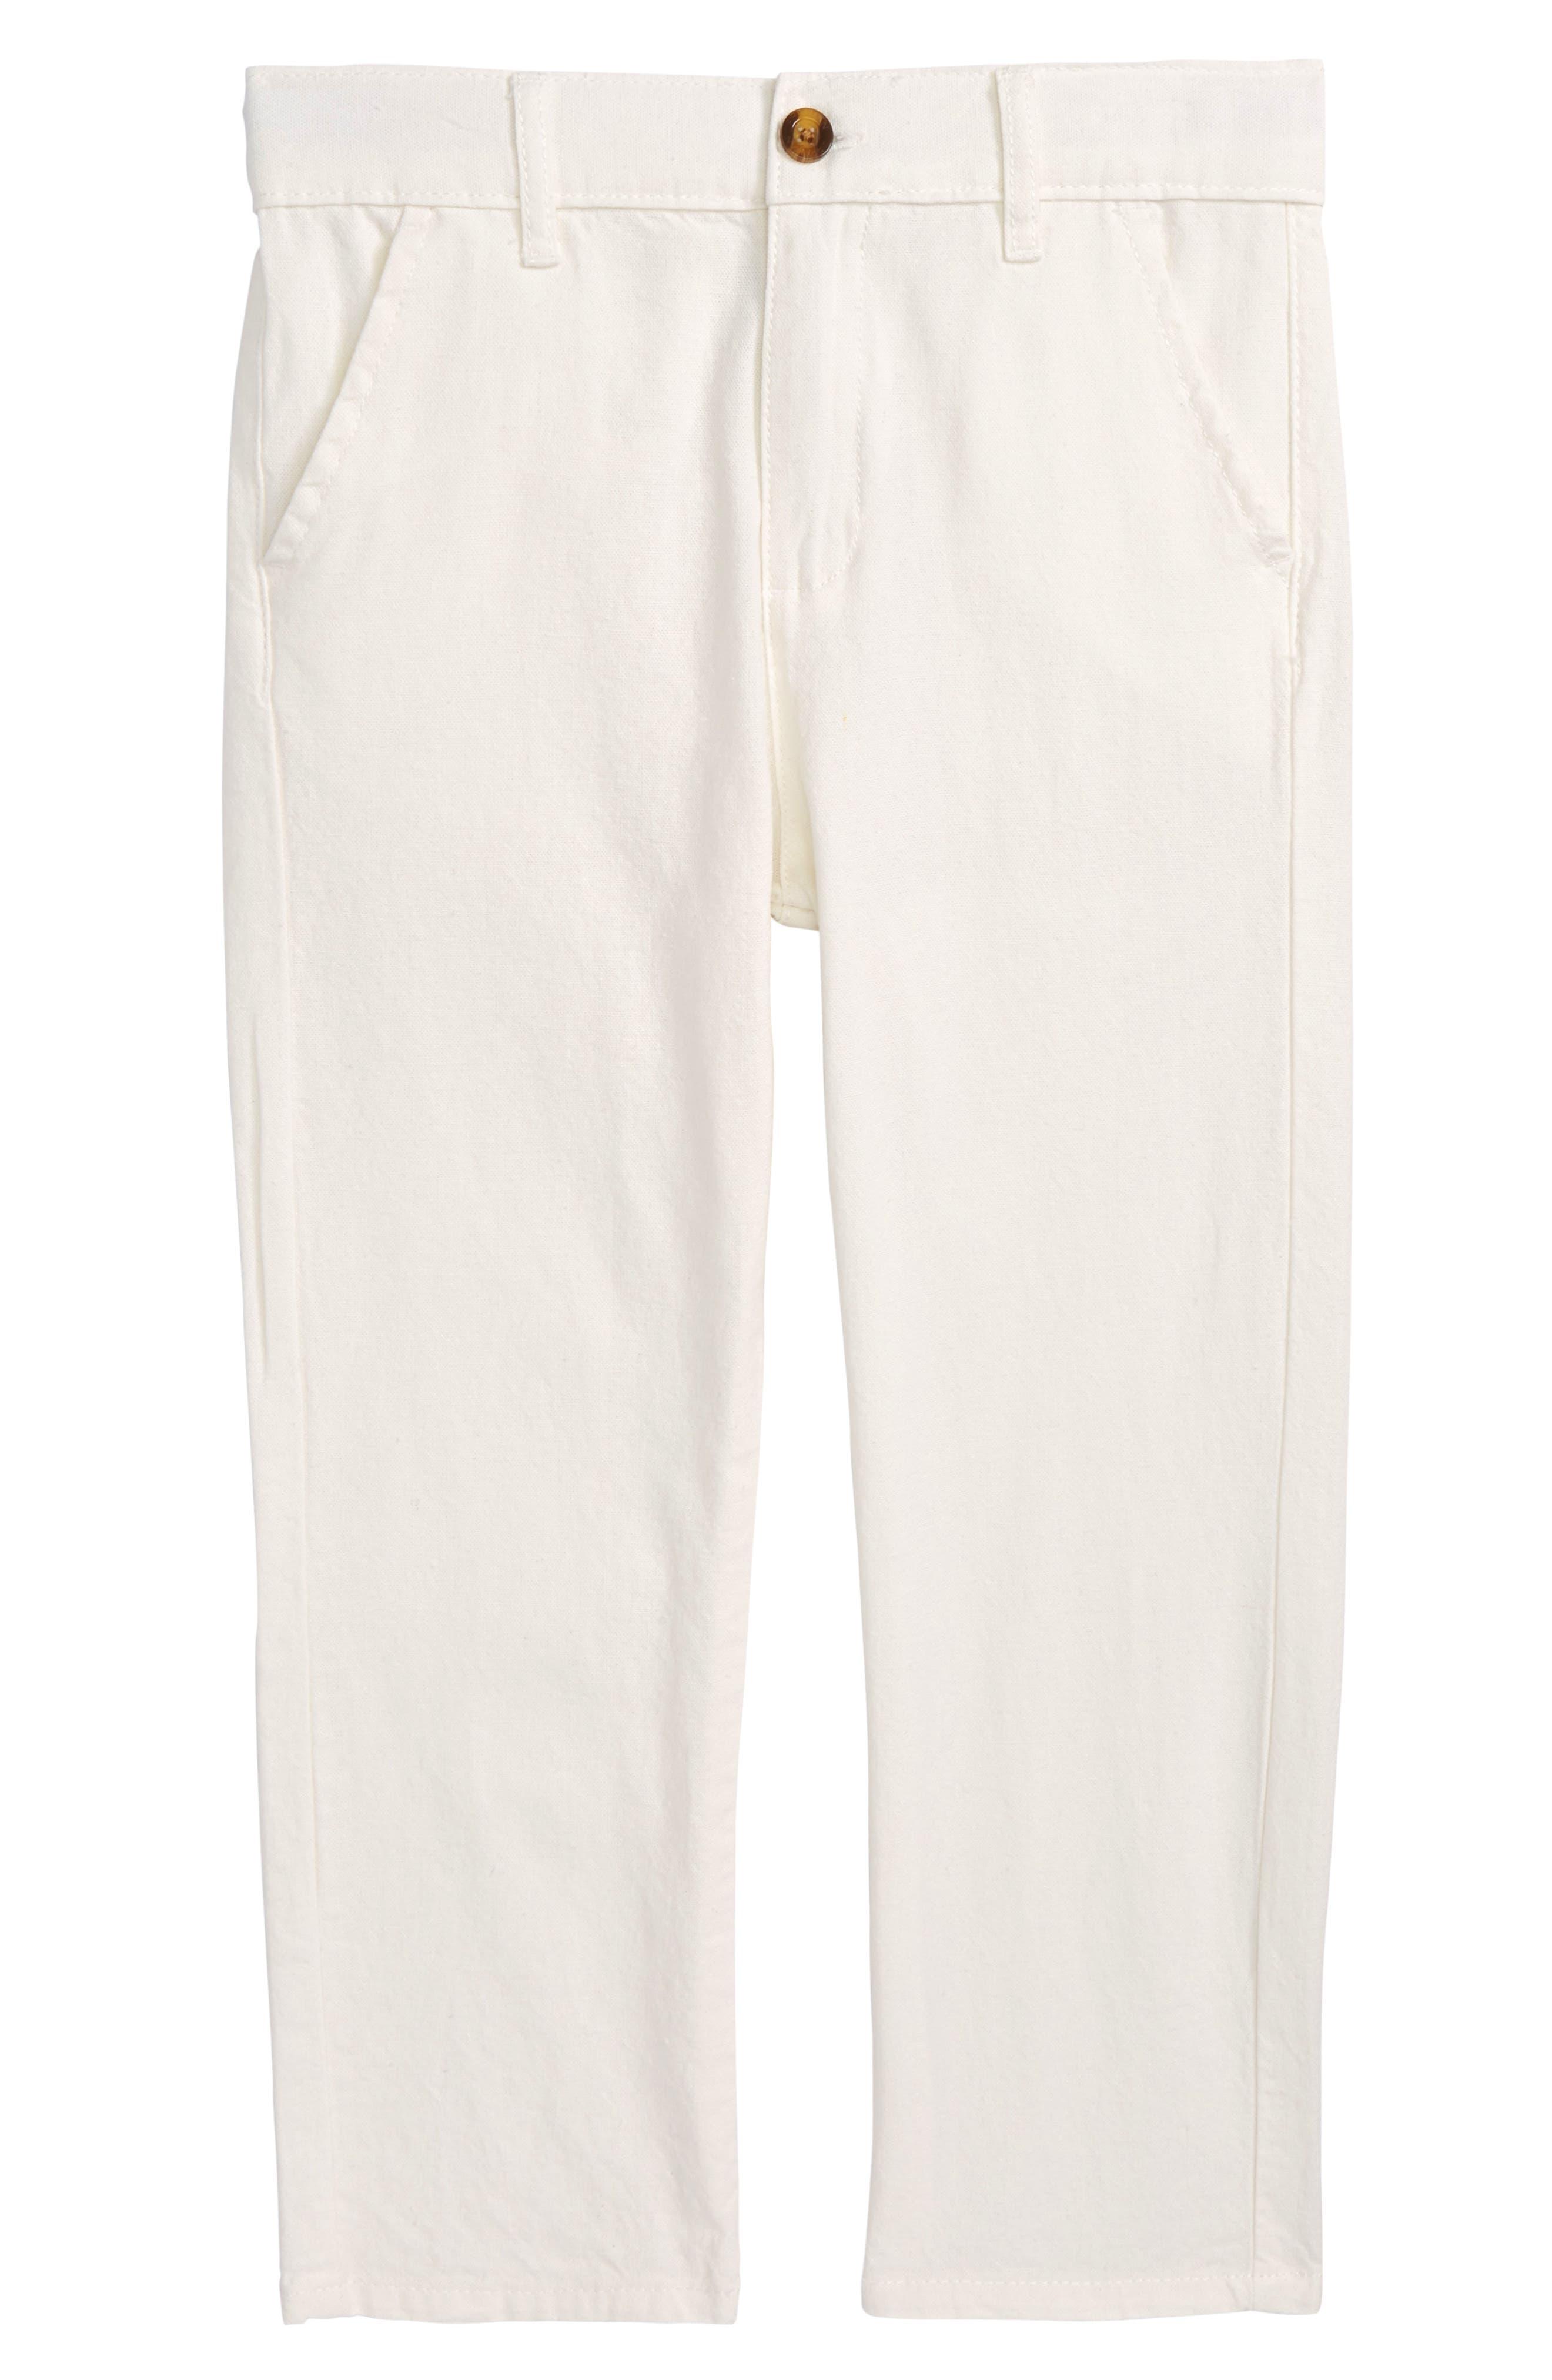 Beach Pants,                         Main,                         color, Ivory